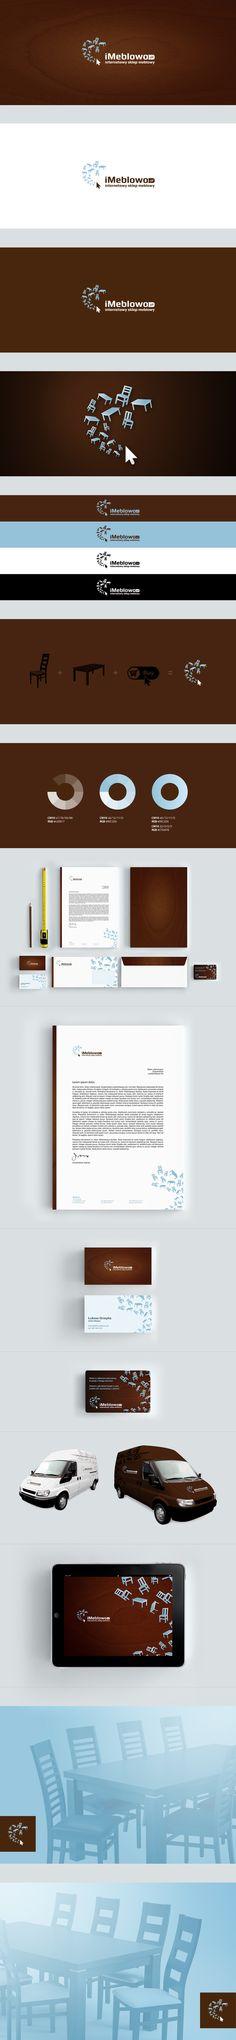 iMeblowo.pl (furniture online shop) - branding by Łukasz Ociepka, via Behance   #stationary #corporate #design #corporatedesign #logo #identity #branding #marketing <<< repinned by an #advertising agency from #Hamburg / #Germany - www.BlickeDeeler.de   Follow us on www.facebook.com/BlickeDeeler